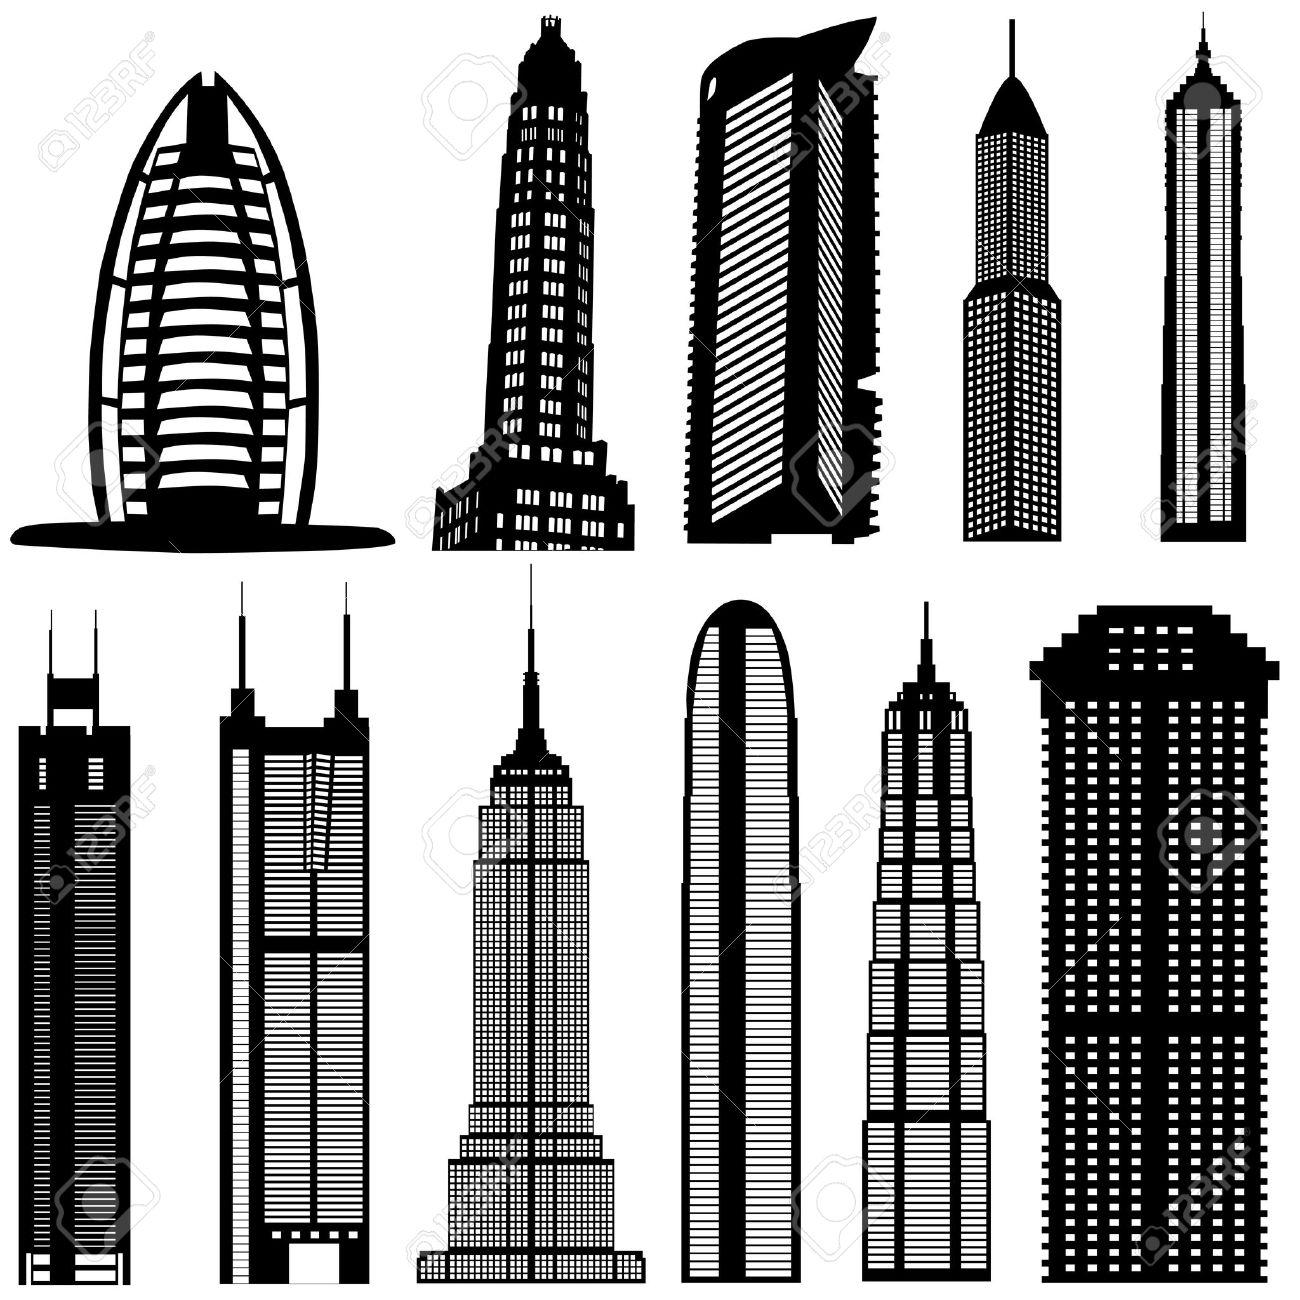 skyscraper buildings vector royalty free cliparts vectors and rh 123rf com dubai skyscraper vector skyscraper vector free